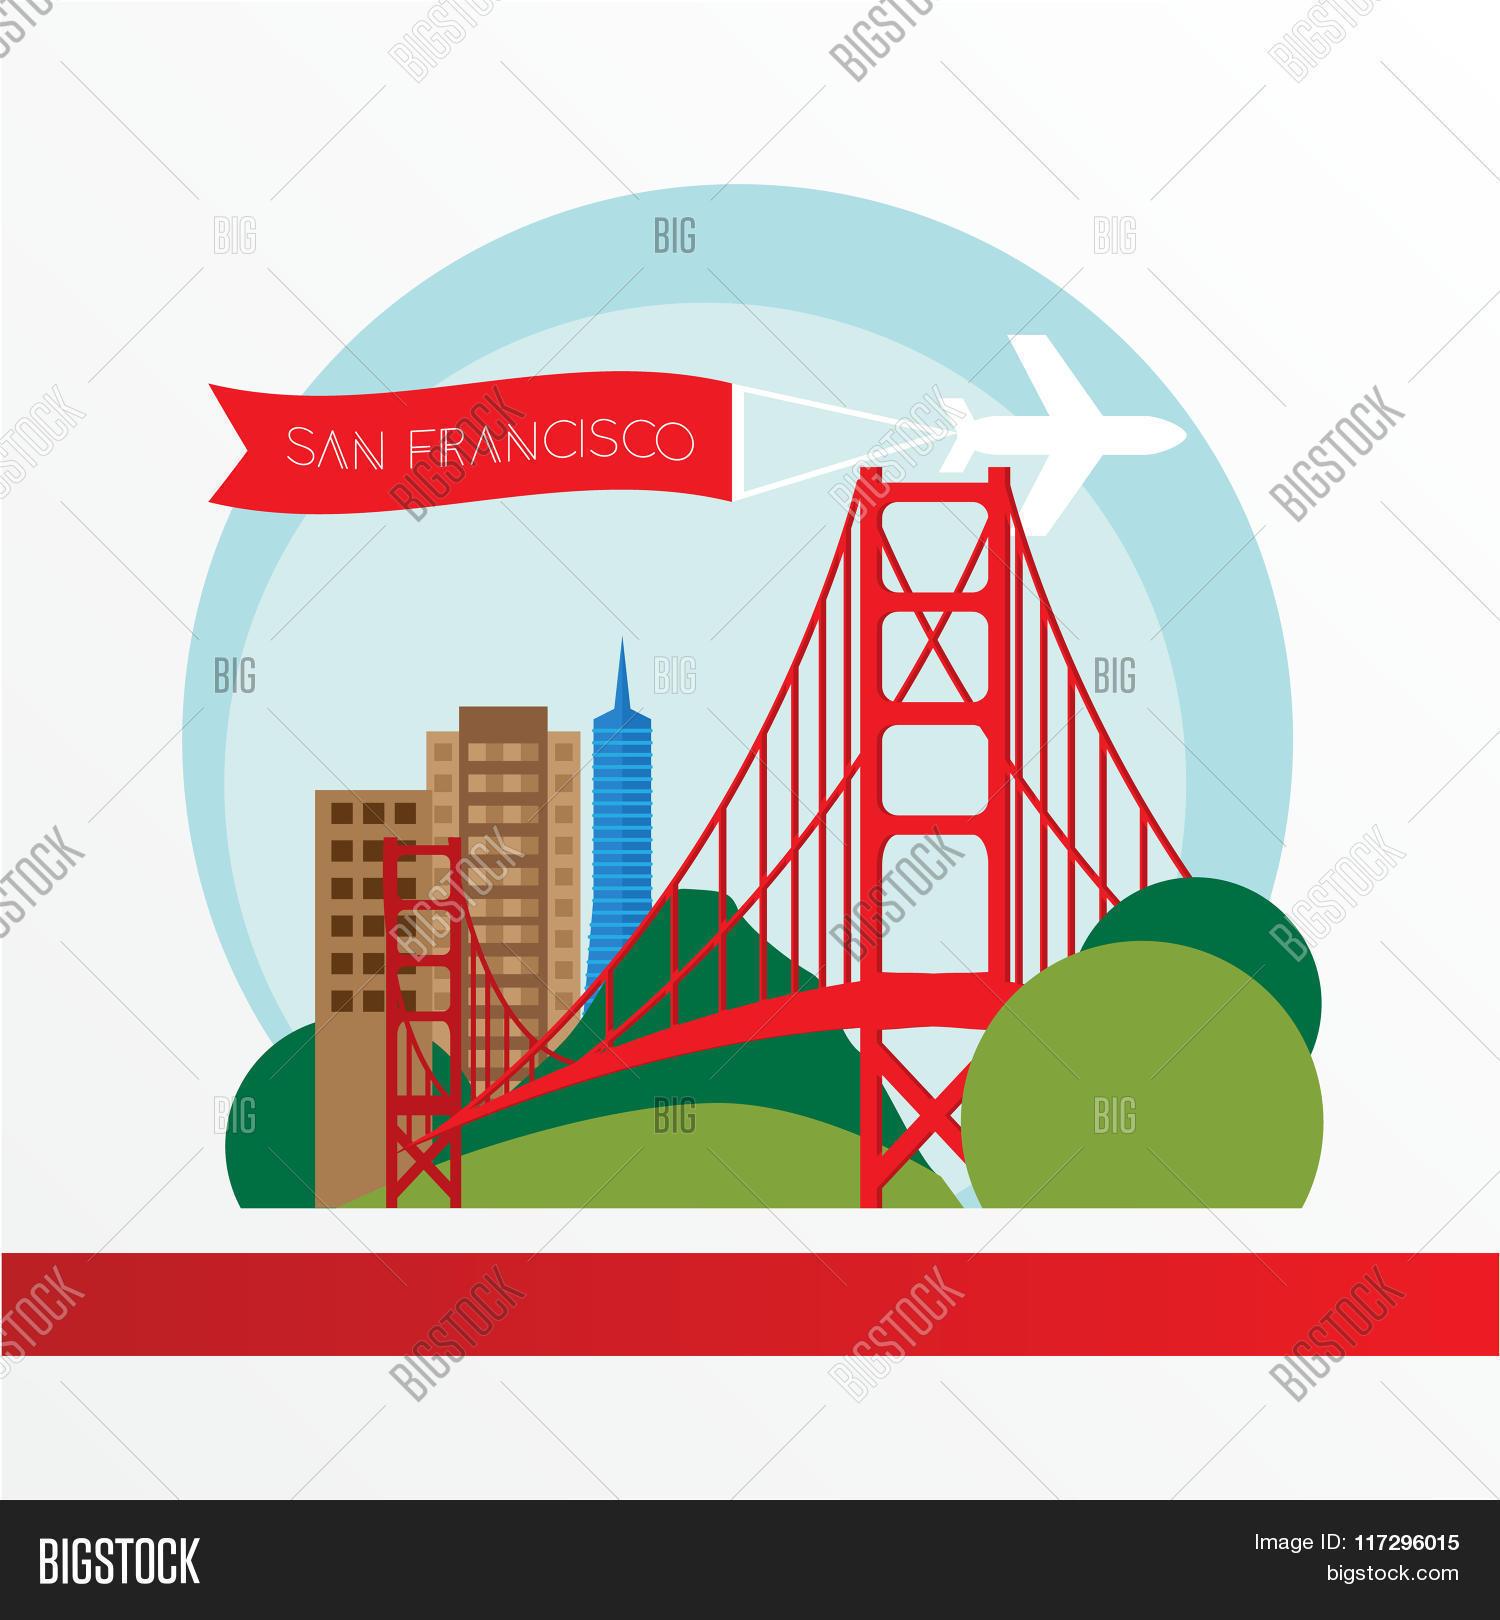 Golden Gate Bridge Vector Photo Free Trial Bigstock Diagram Of The Symbol Us San Francisco Vintage Stamp With